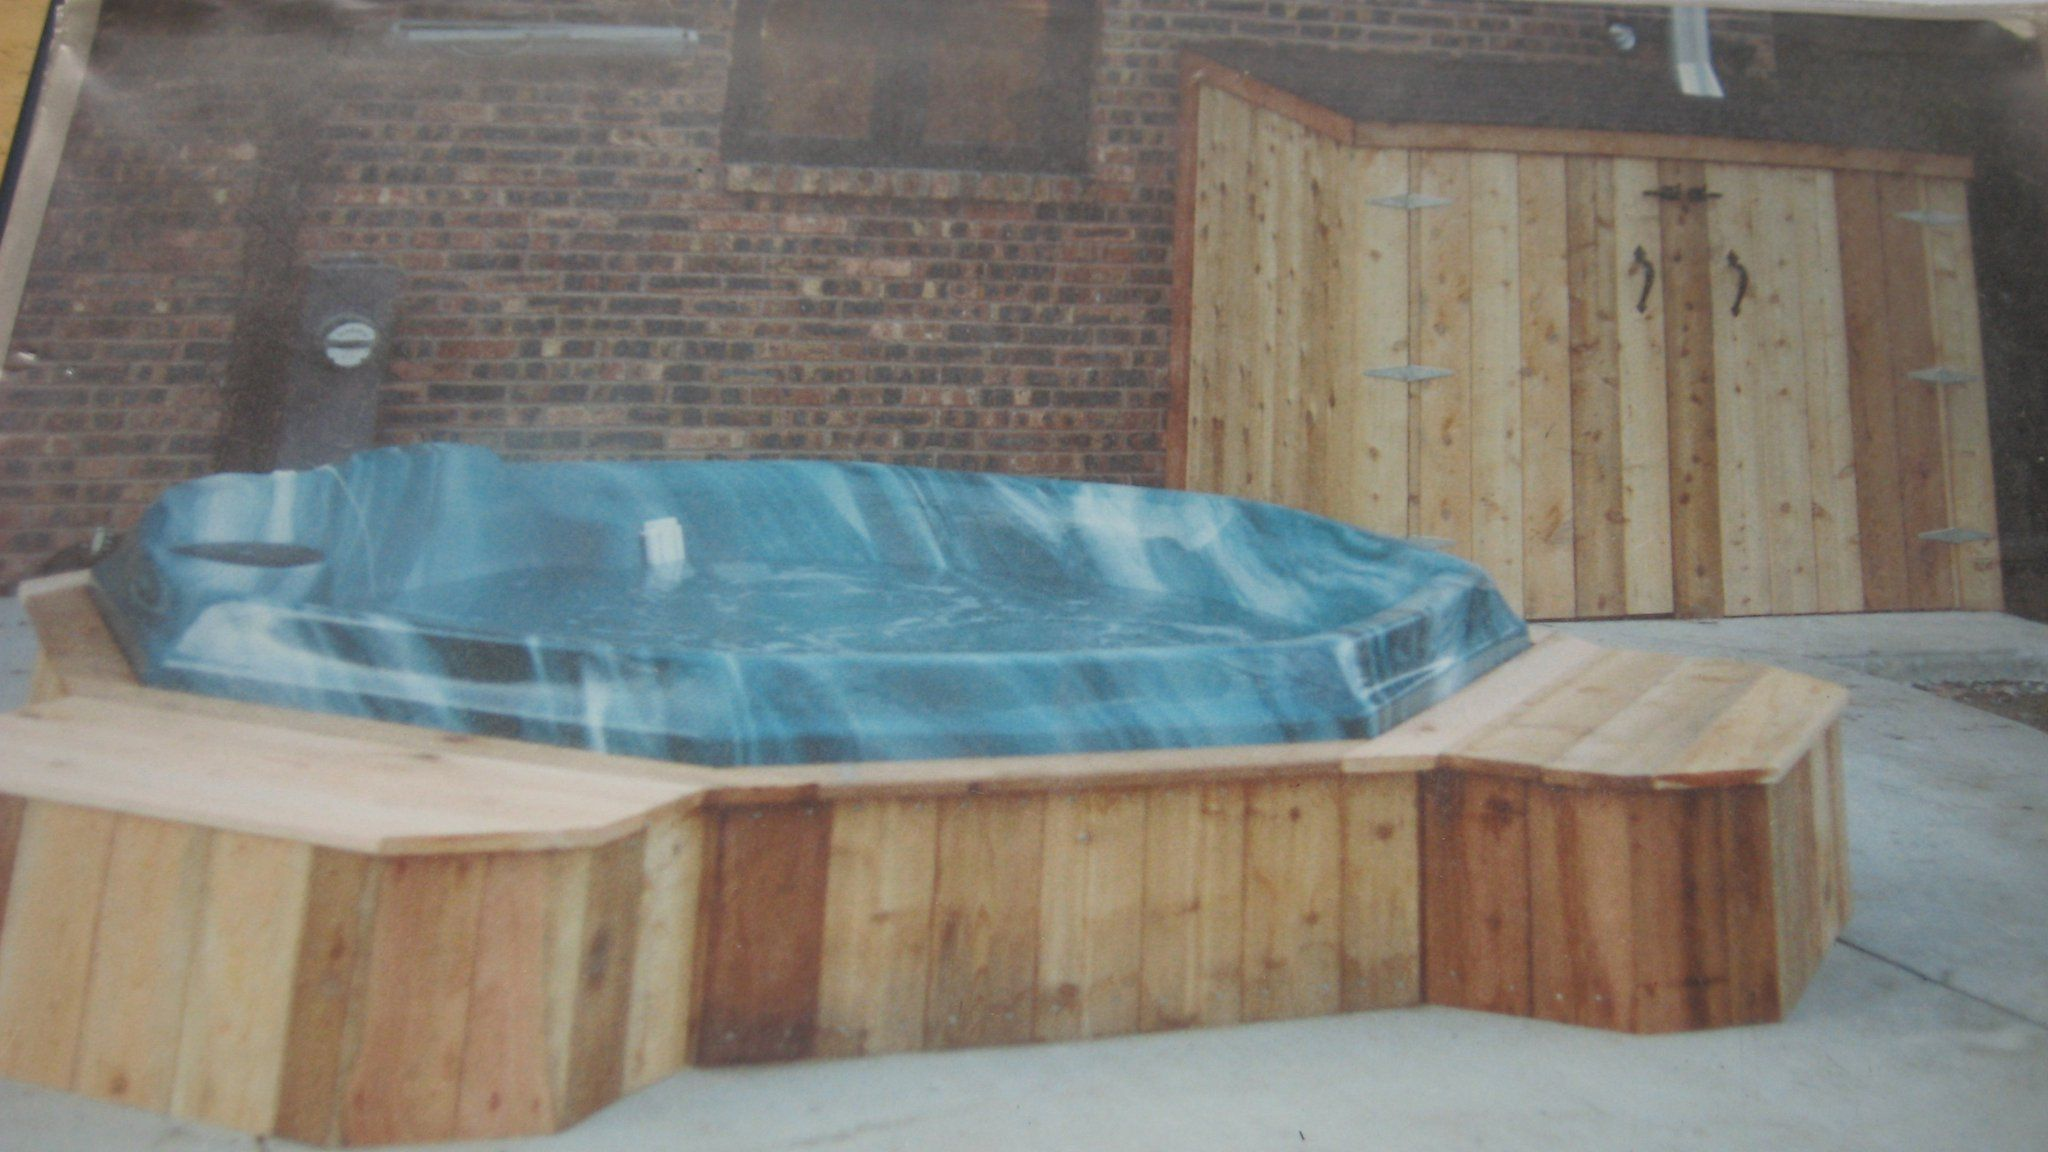 hot tub enclosure | #Decks #northwestindiana | Pinterest | Tub ...